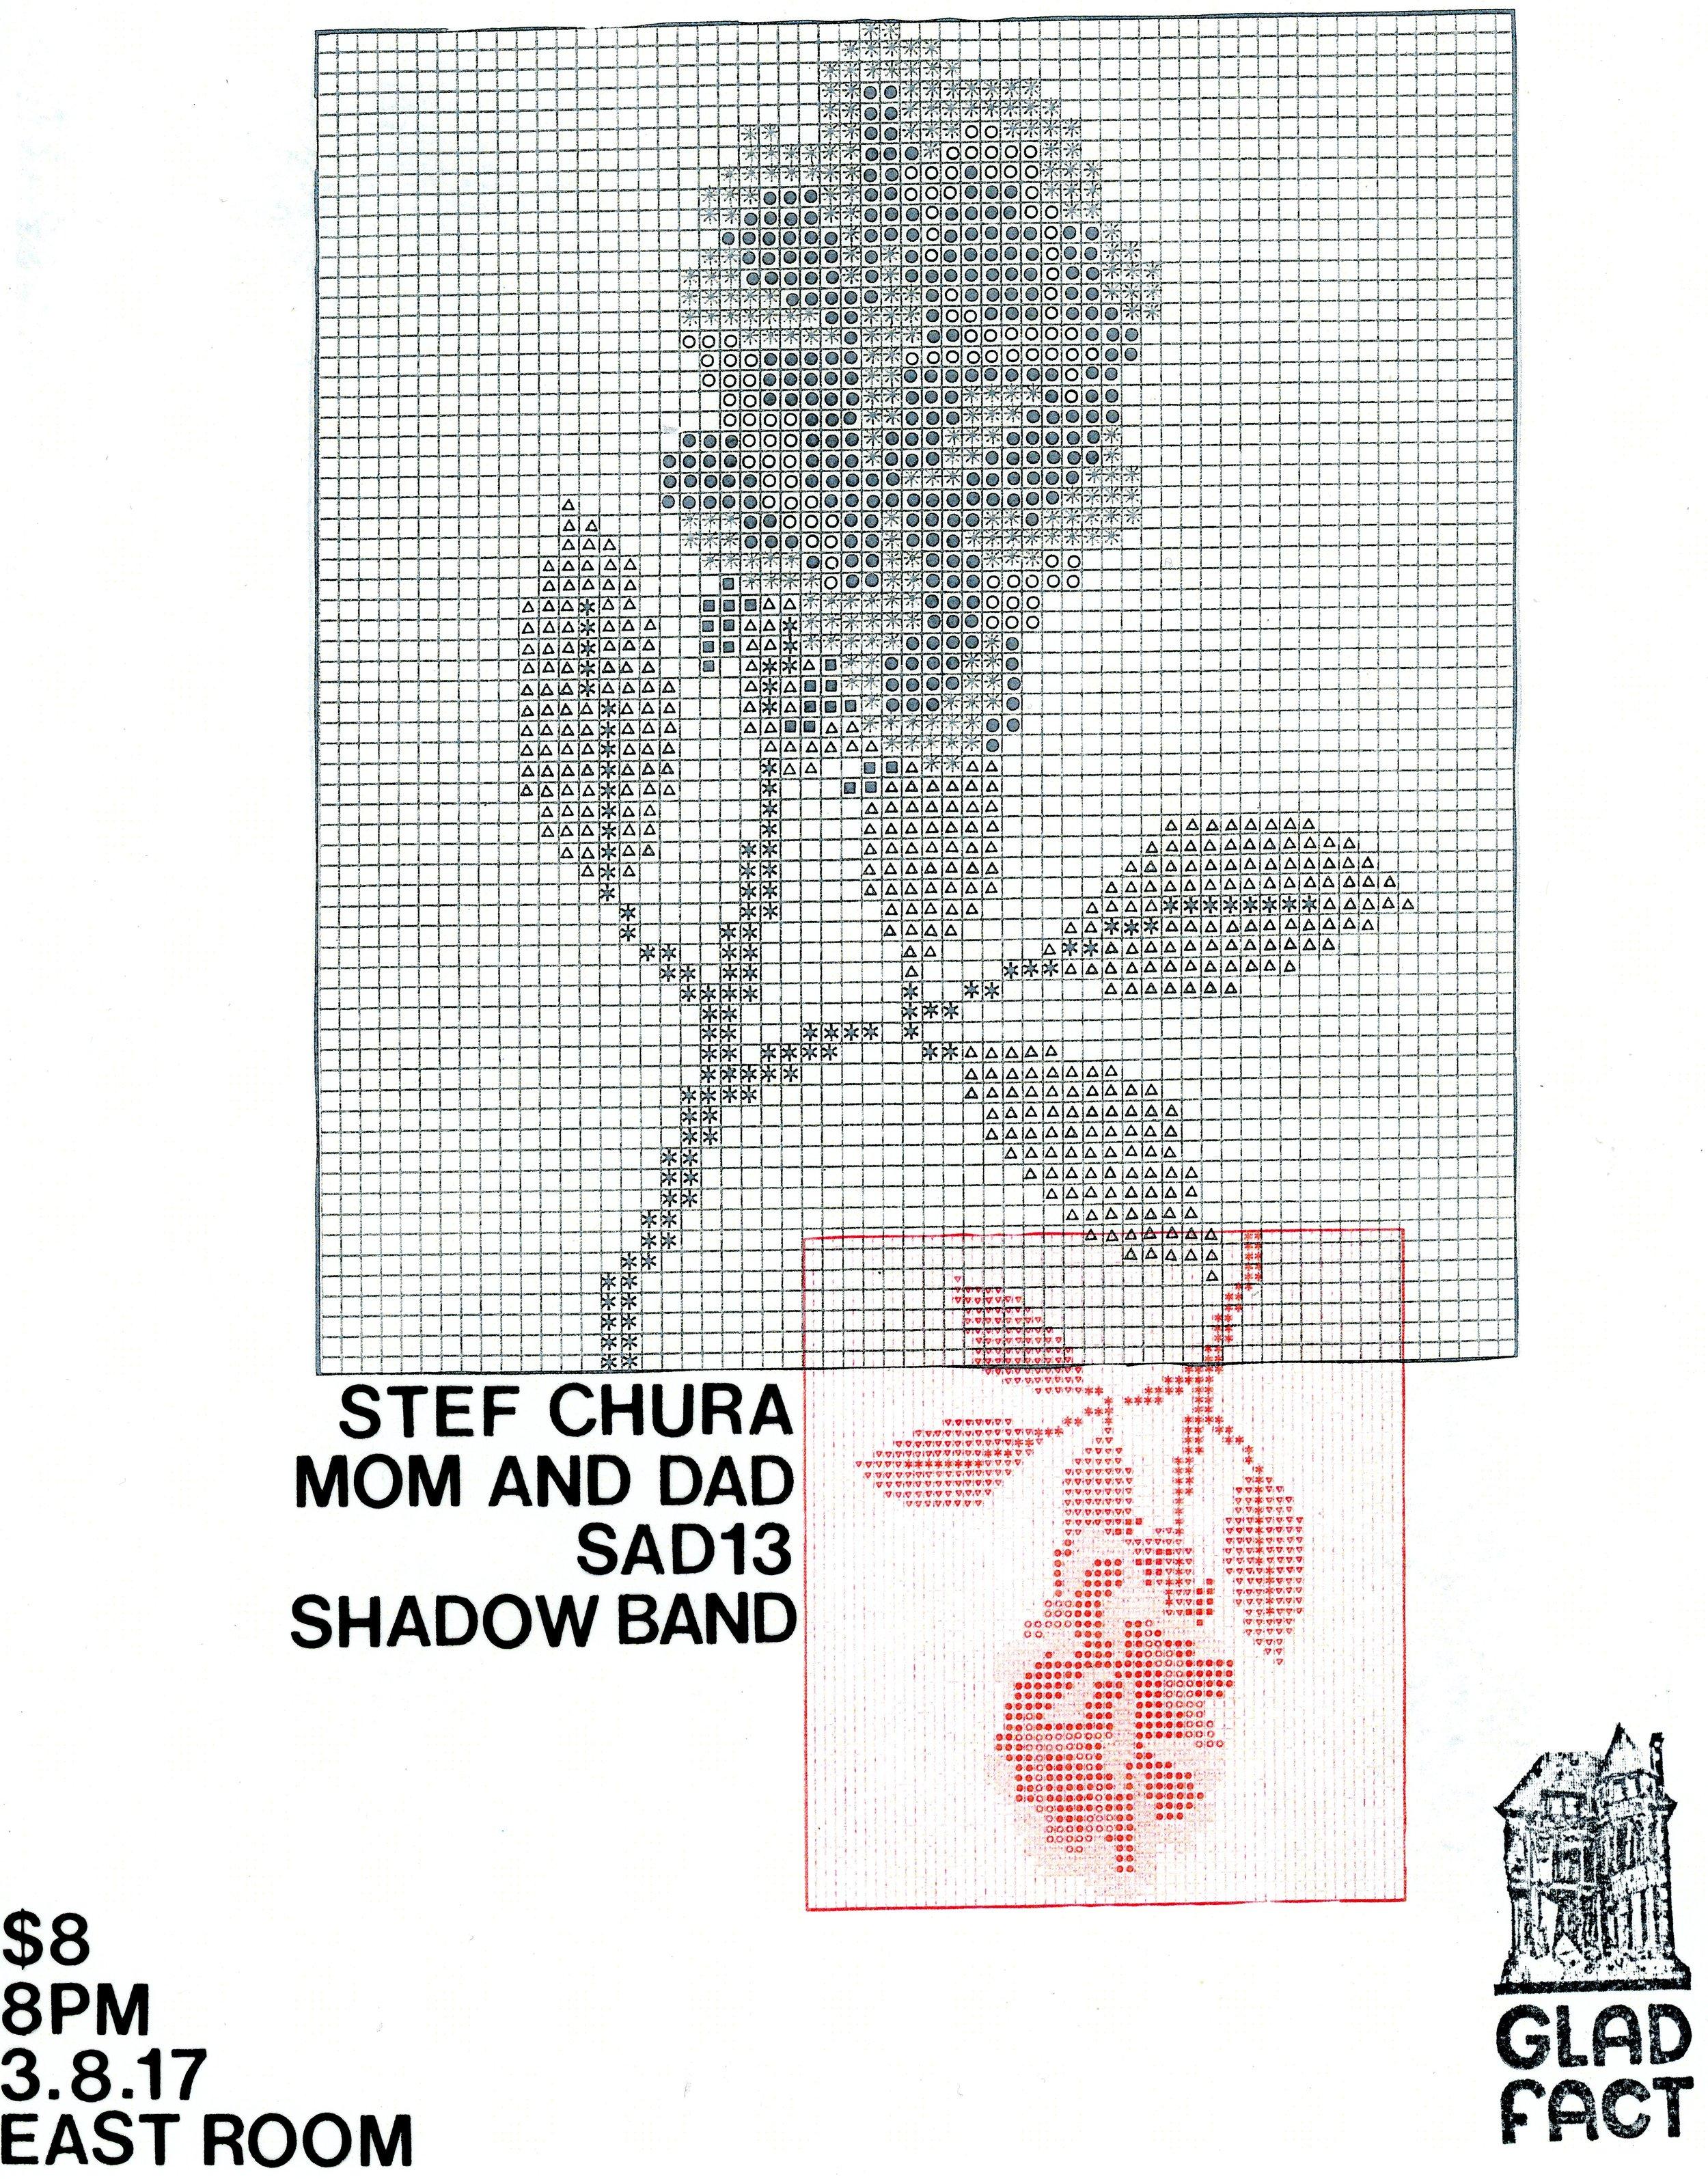 2017:3:8_STEFCHURA_SHADOWBAND.jpg